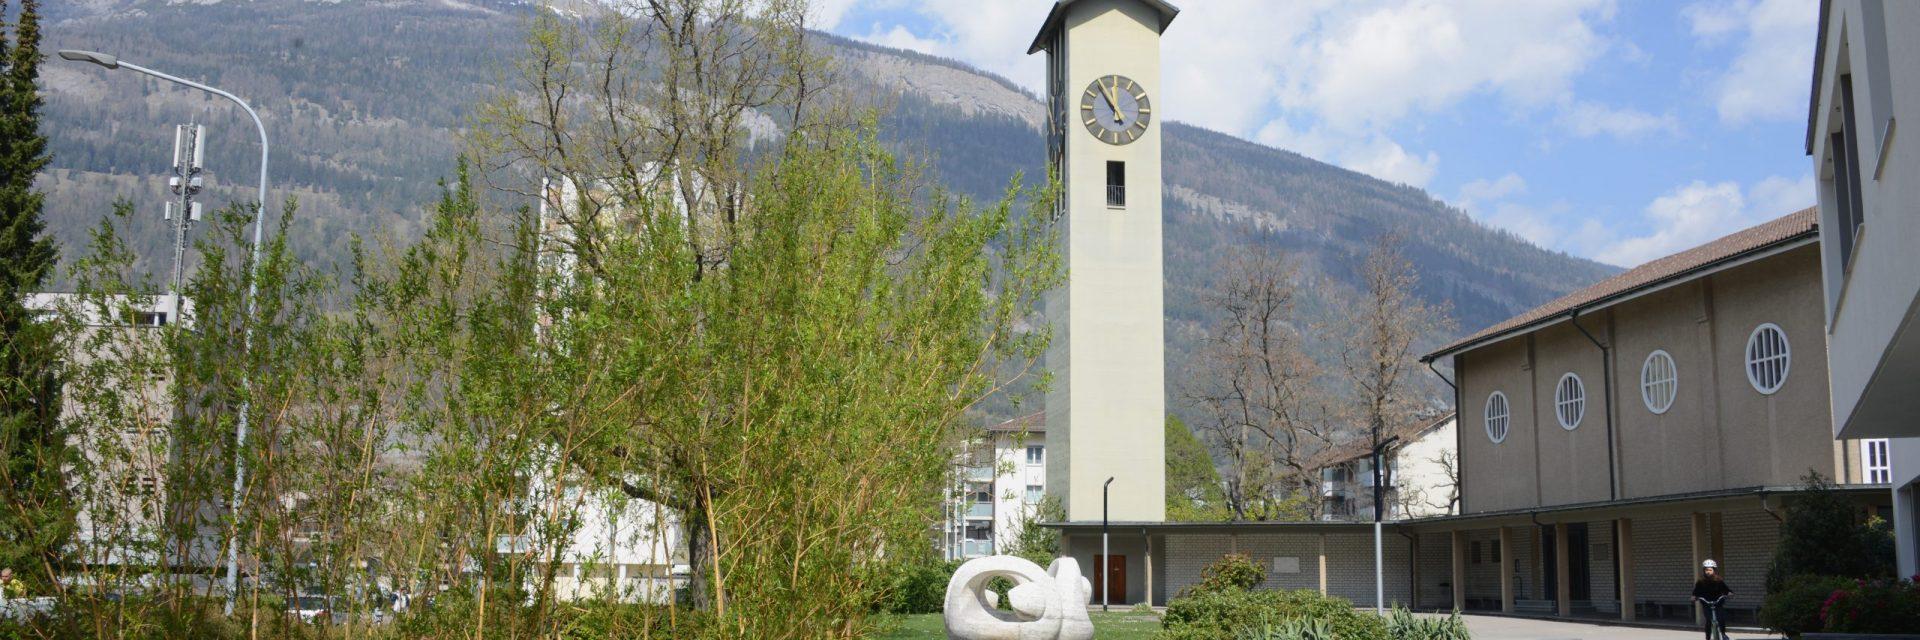 Comander, Kirchen, Frühling